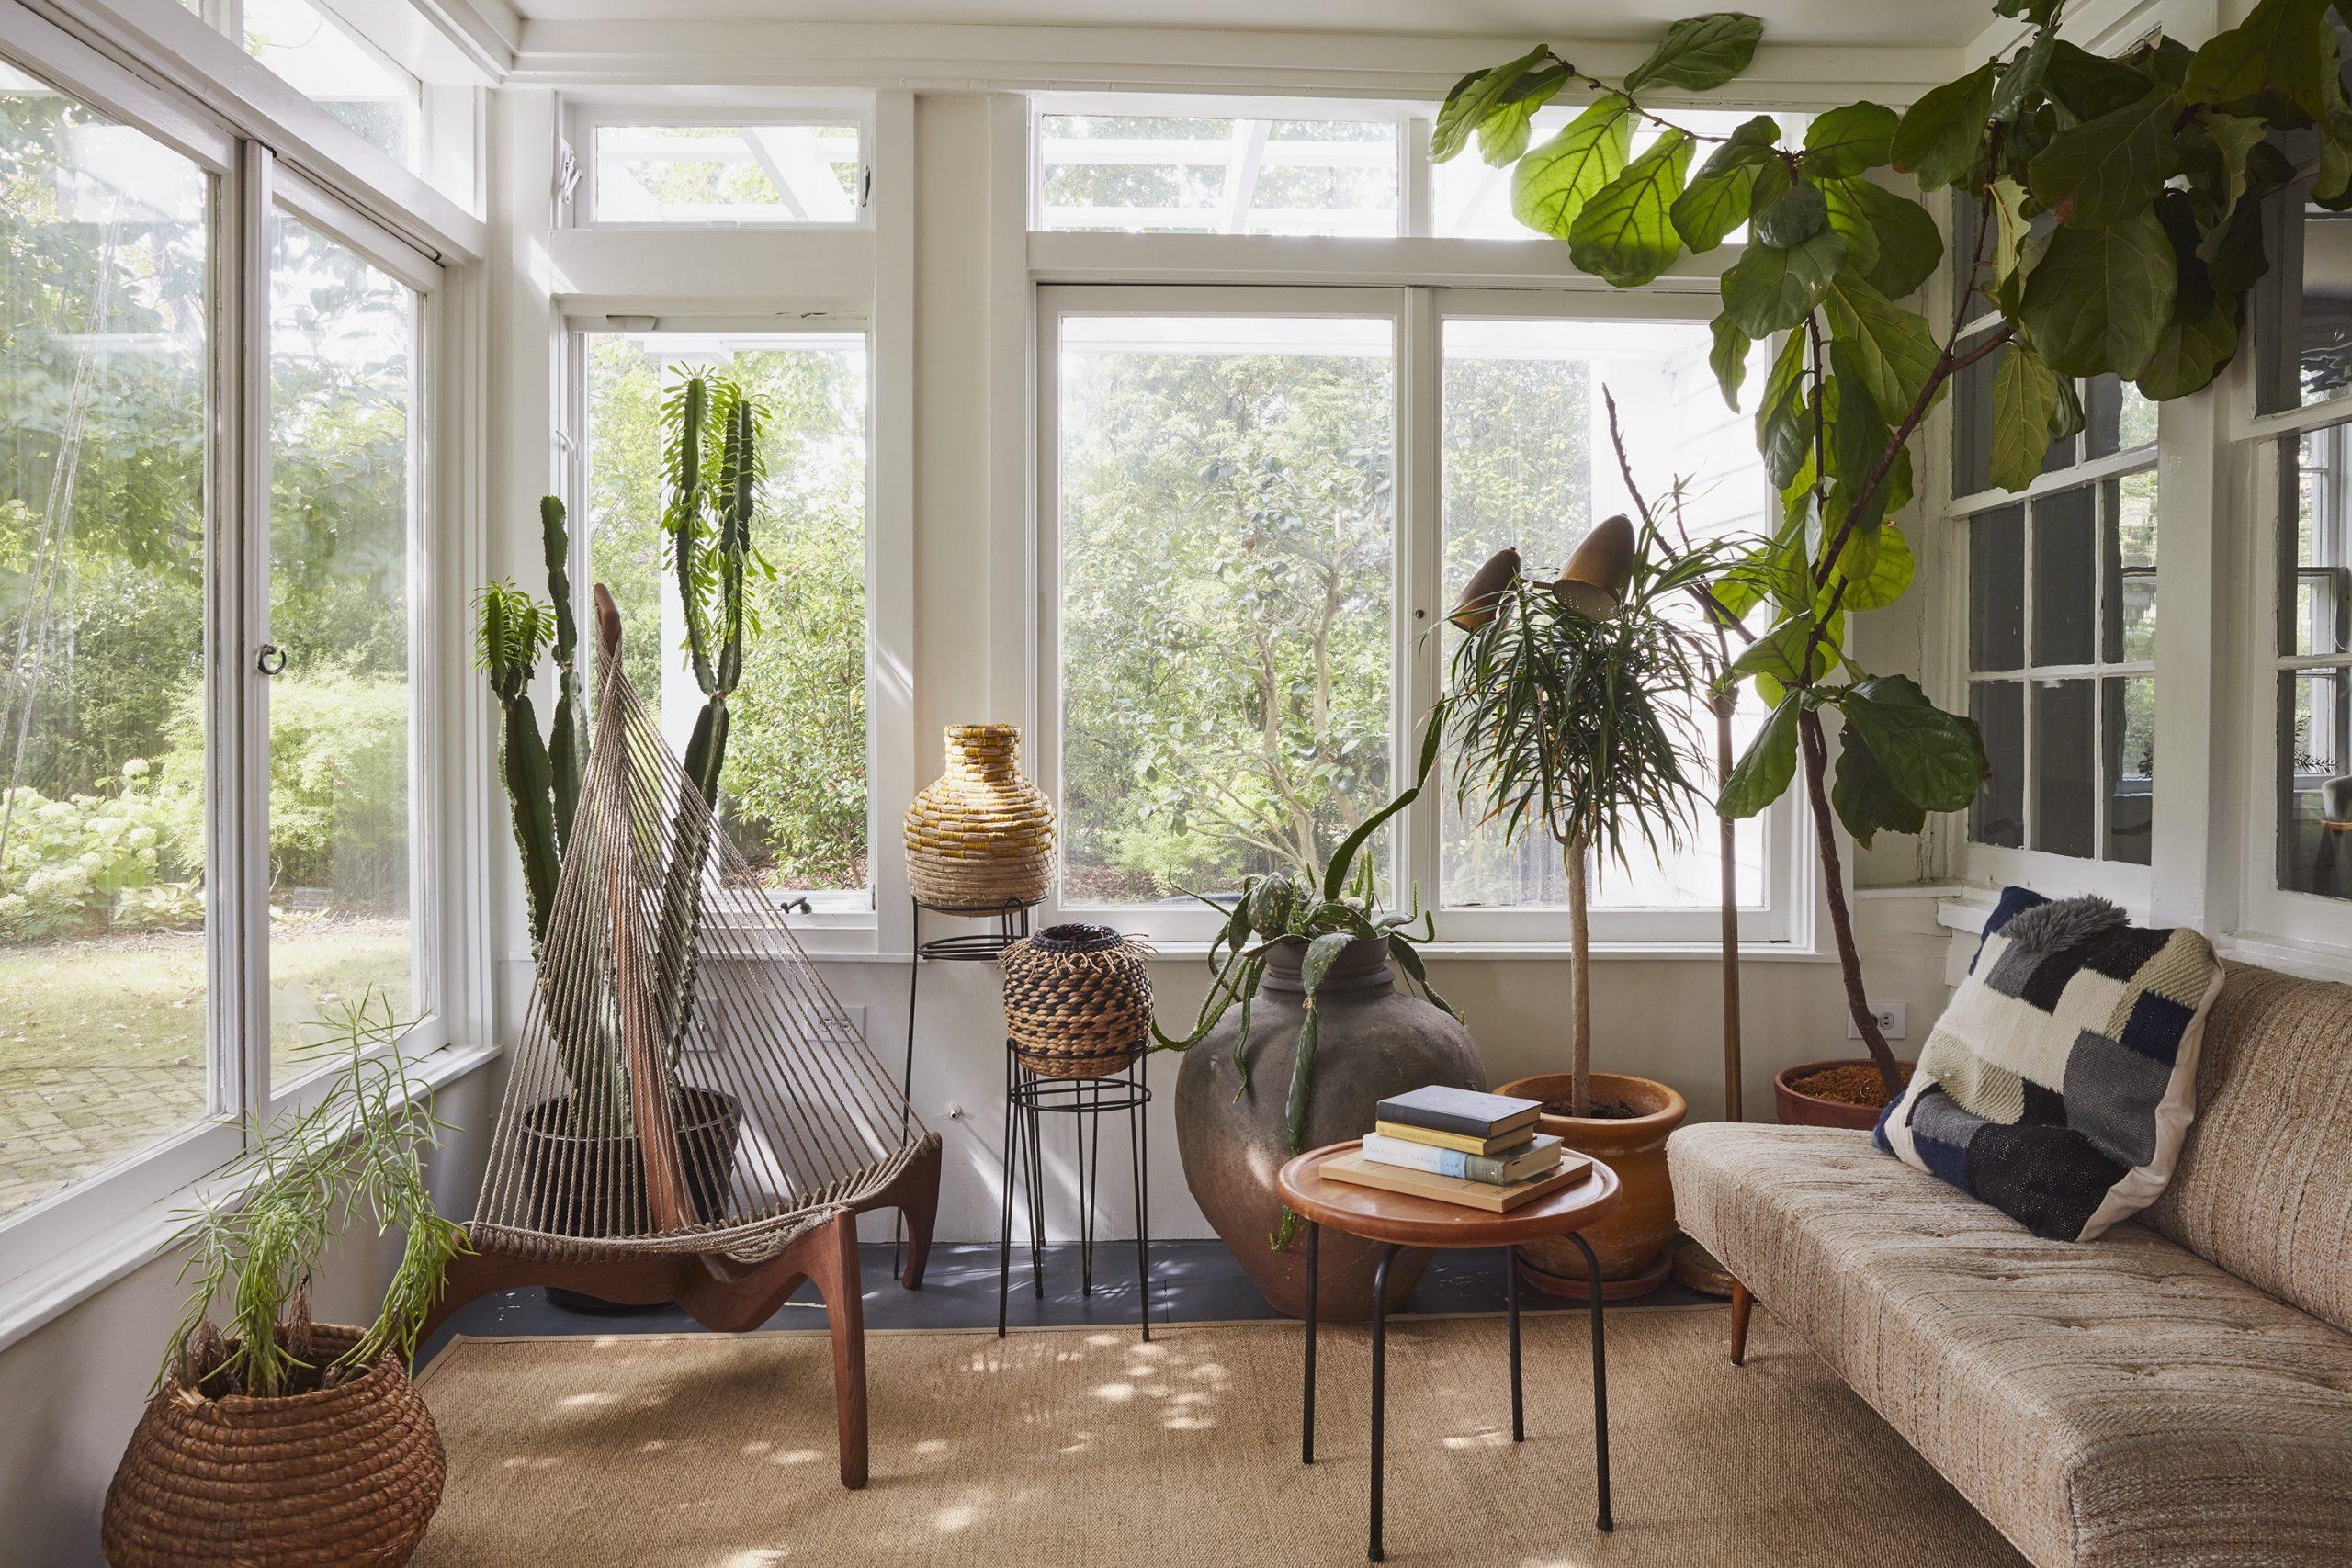 porch sunroom lots of planst and natural light natural color palette custom sunroom builder nj